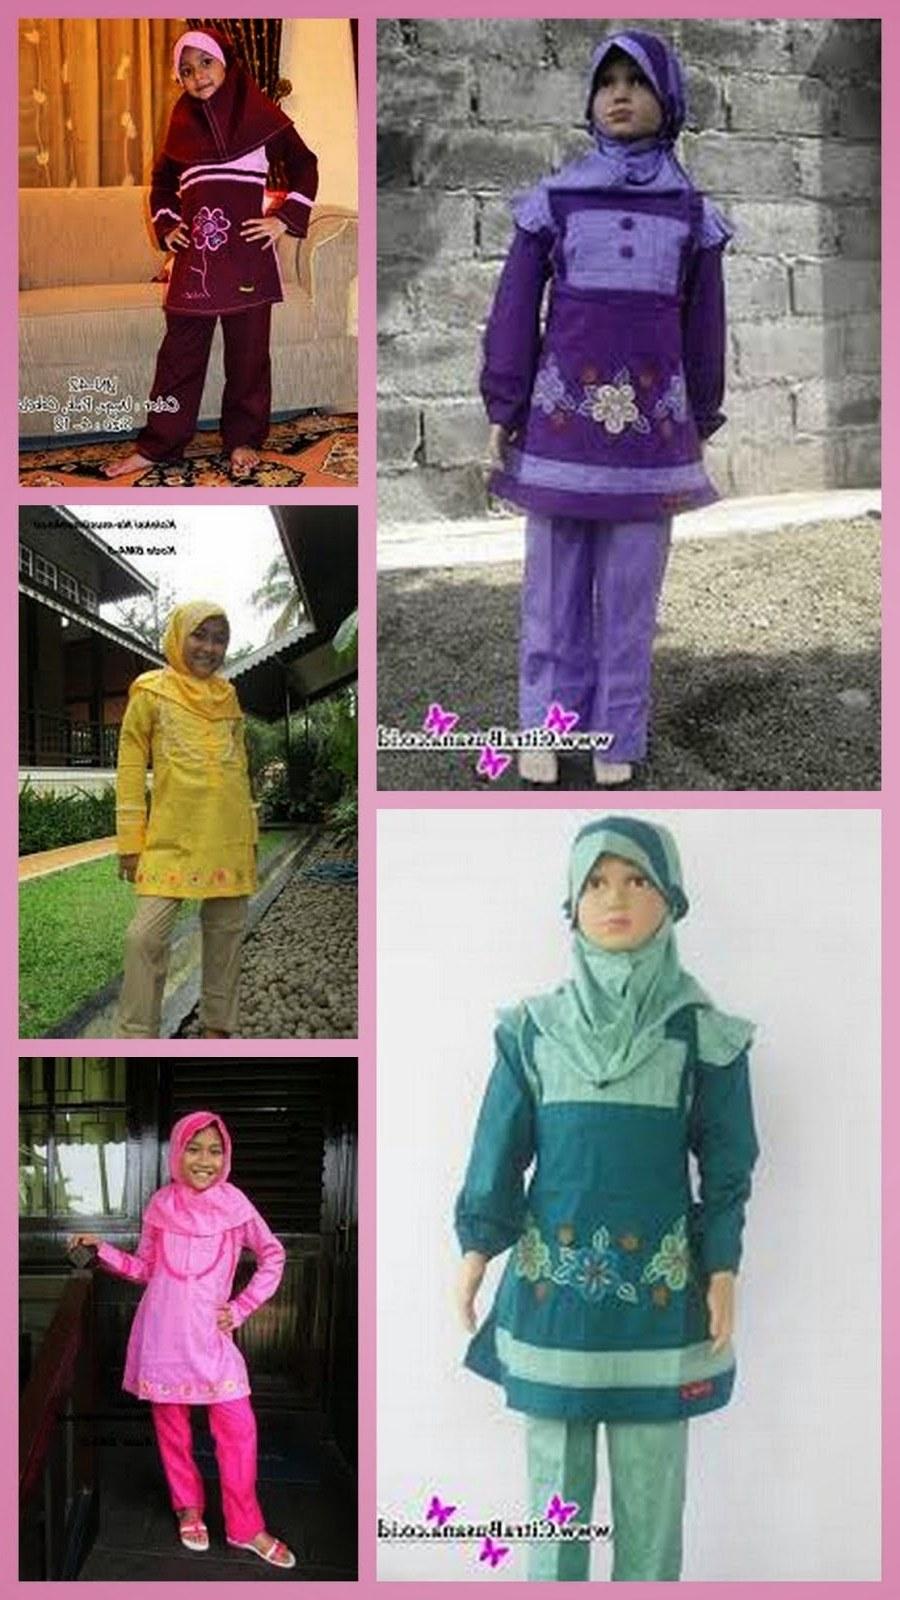 Ide Baju Lebaran Anak Usia 10 Tahun Mndw Baju Muslim Anak Wanita Usia 13 Tahun Untuk Lebaran